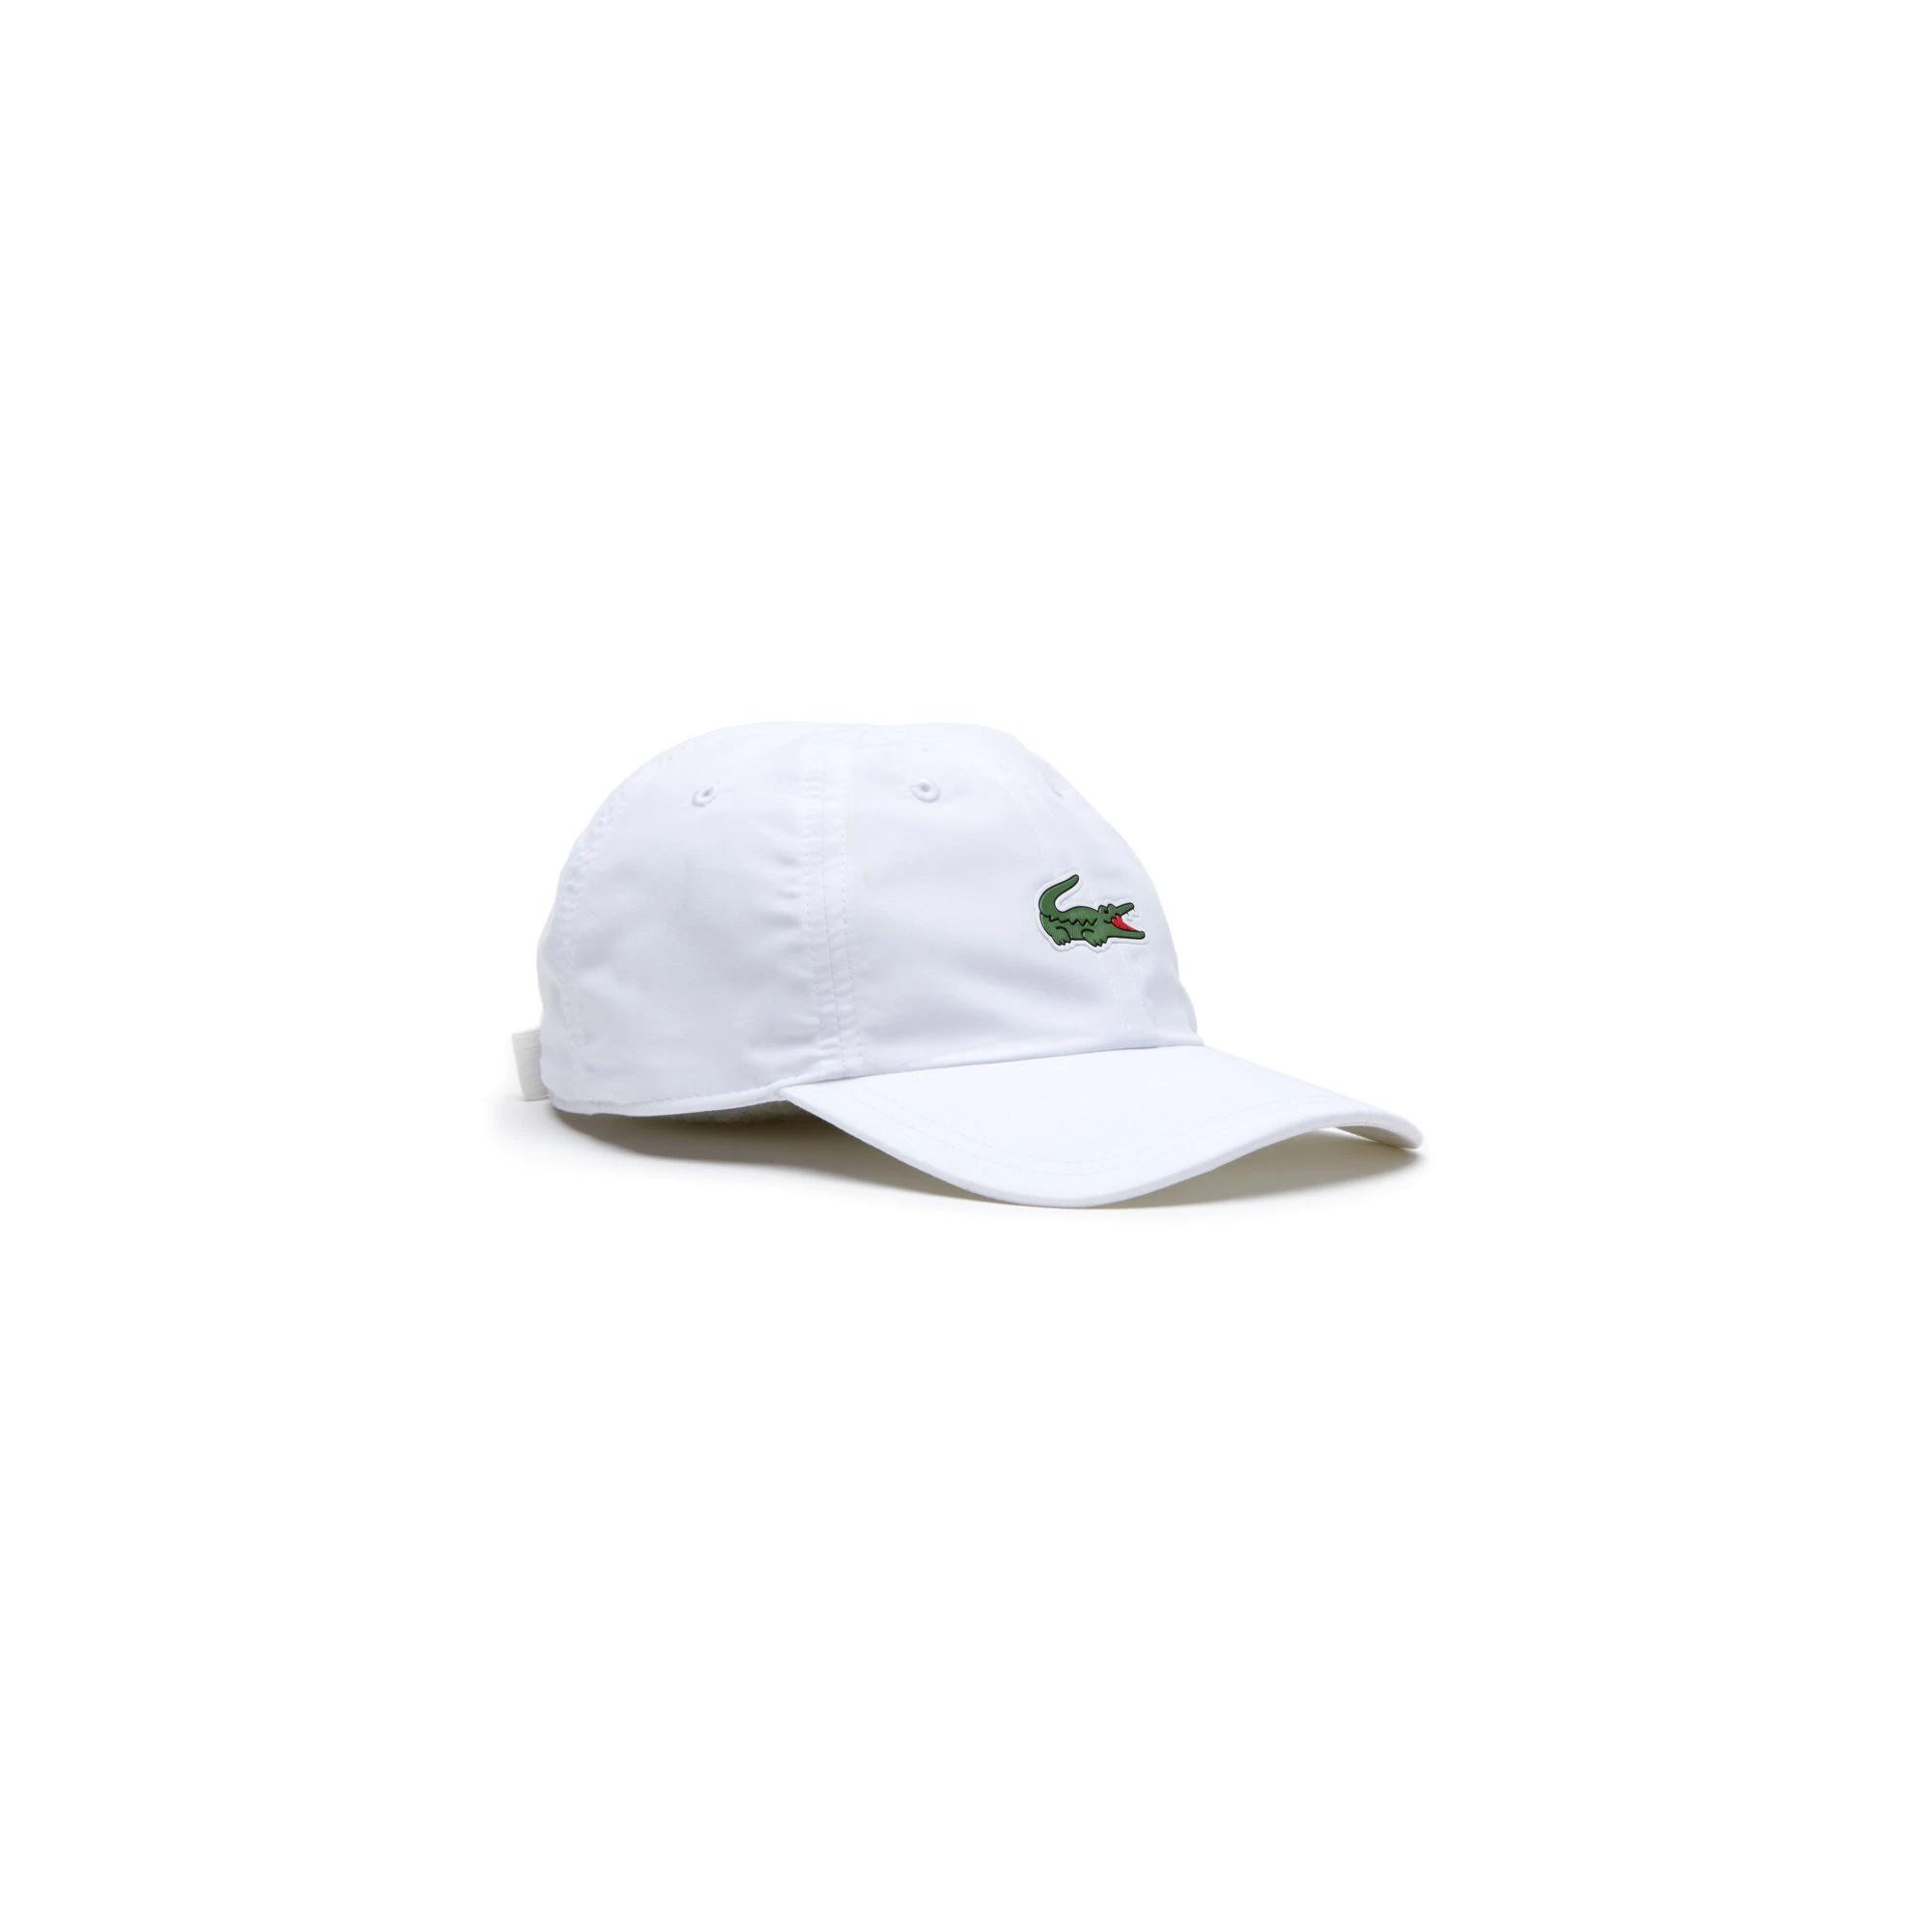 8e9fe66356ea4 Boné Lacoste RK 2464 Branco, Vivano Sports - A loja do tenista